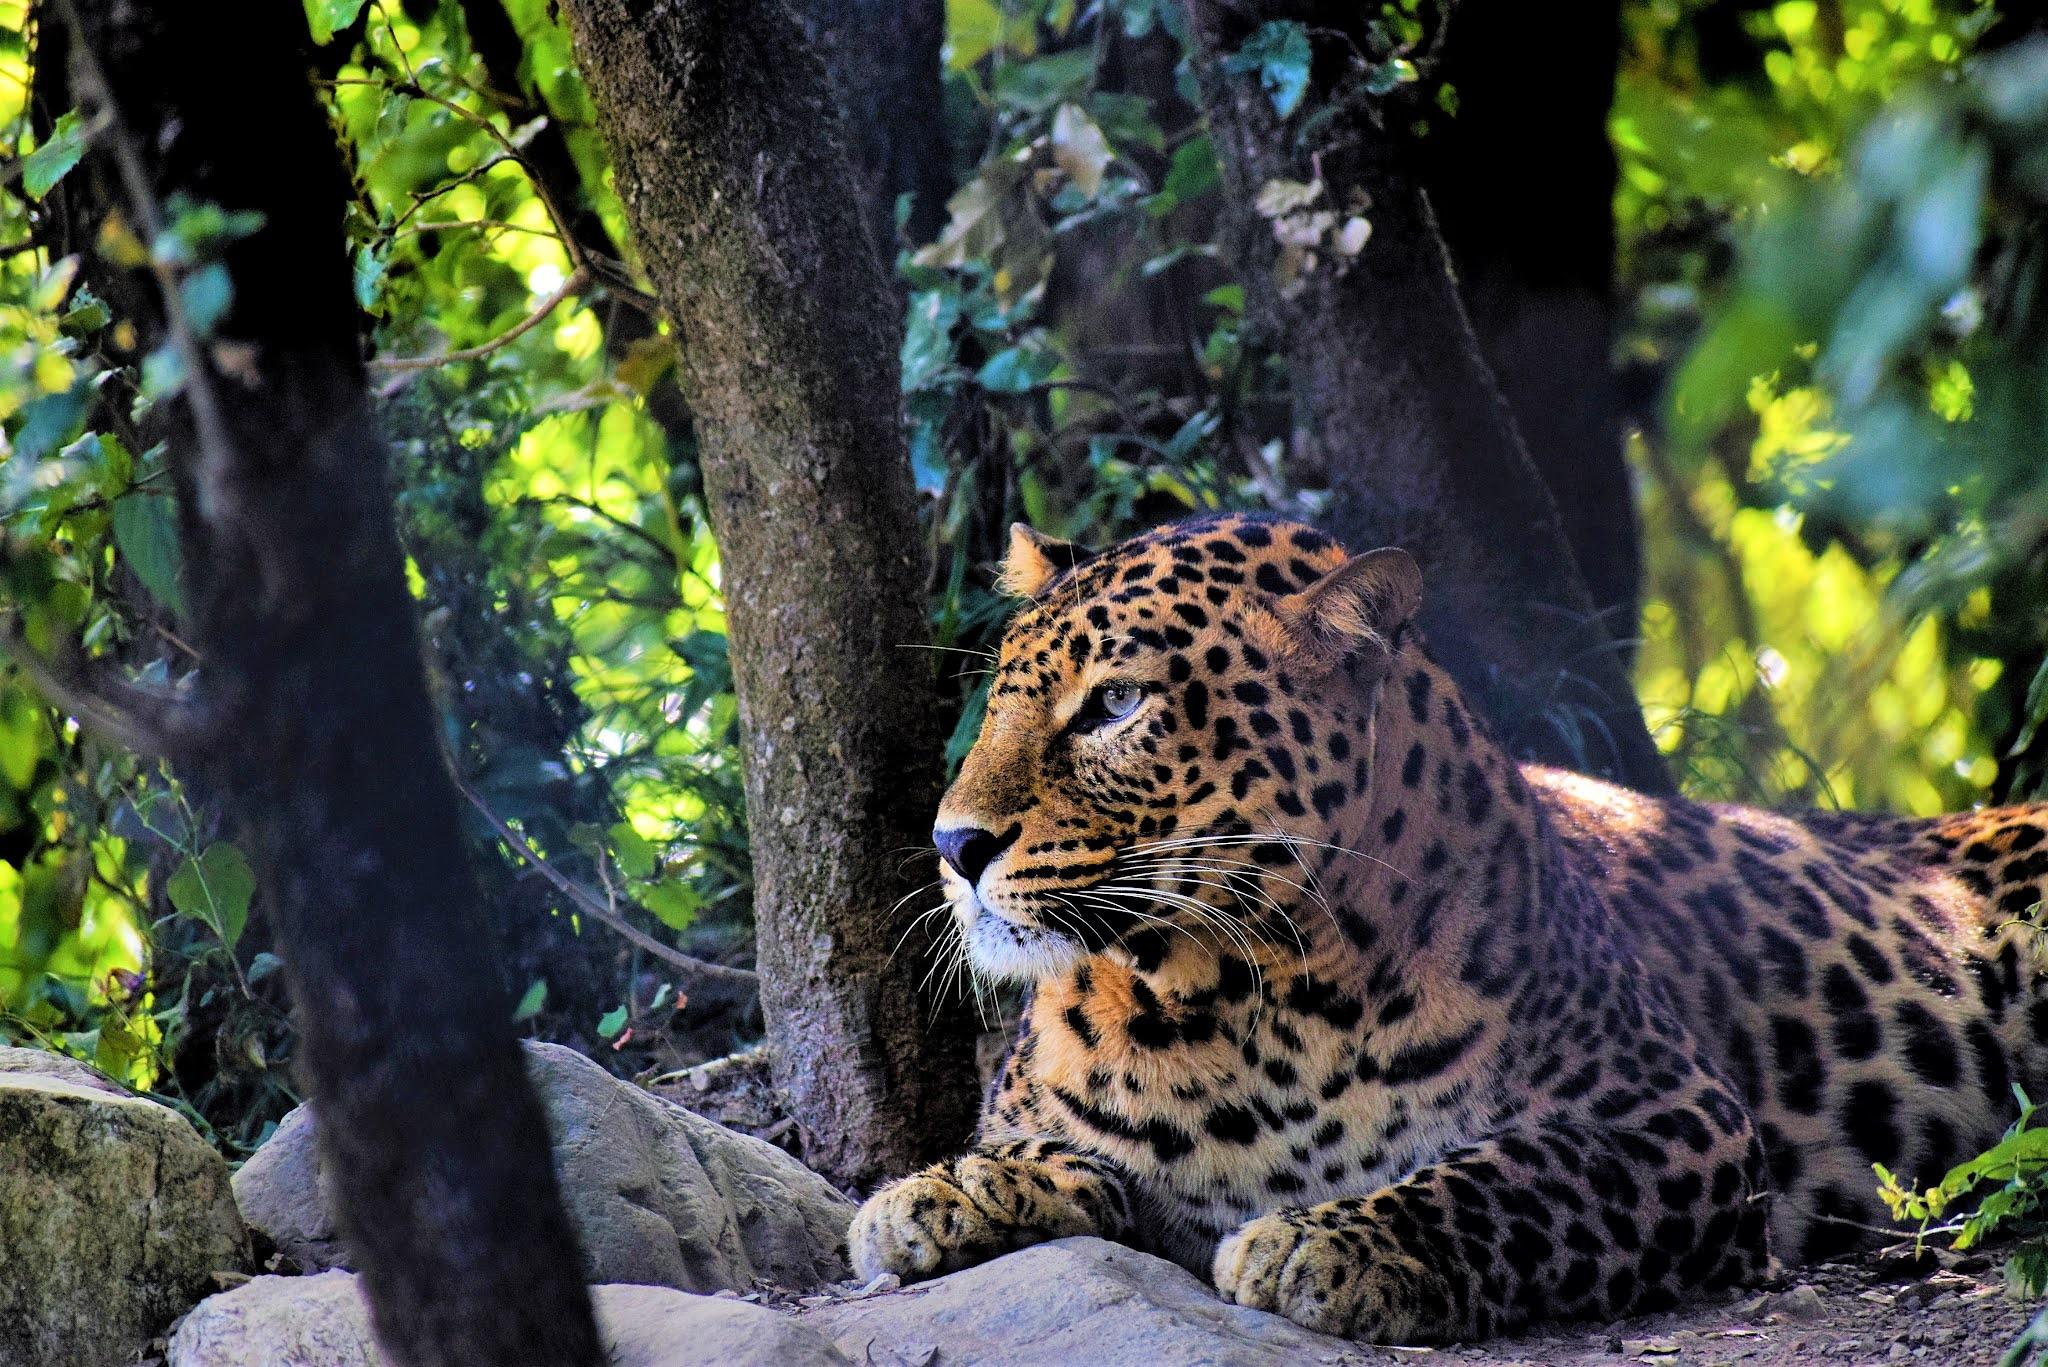 JIM CORBETT NATIONAL PARK: THE PARADISE OF TIGERS